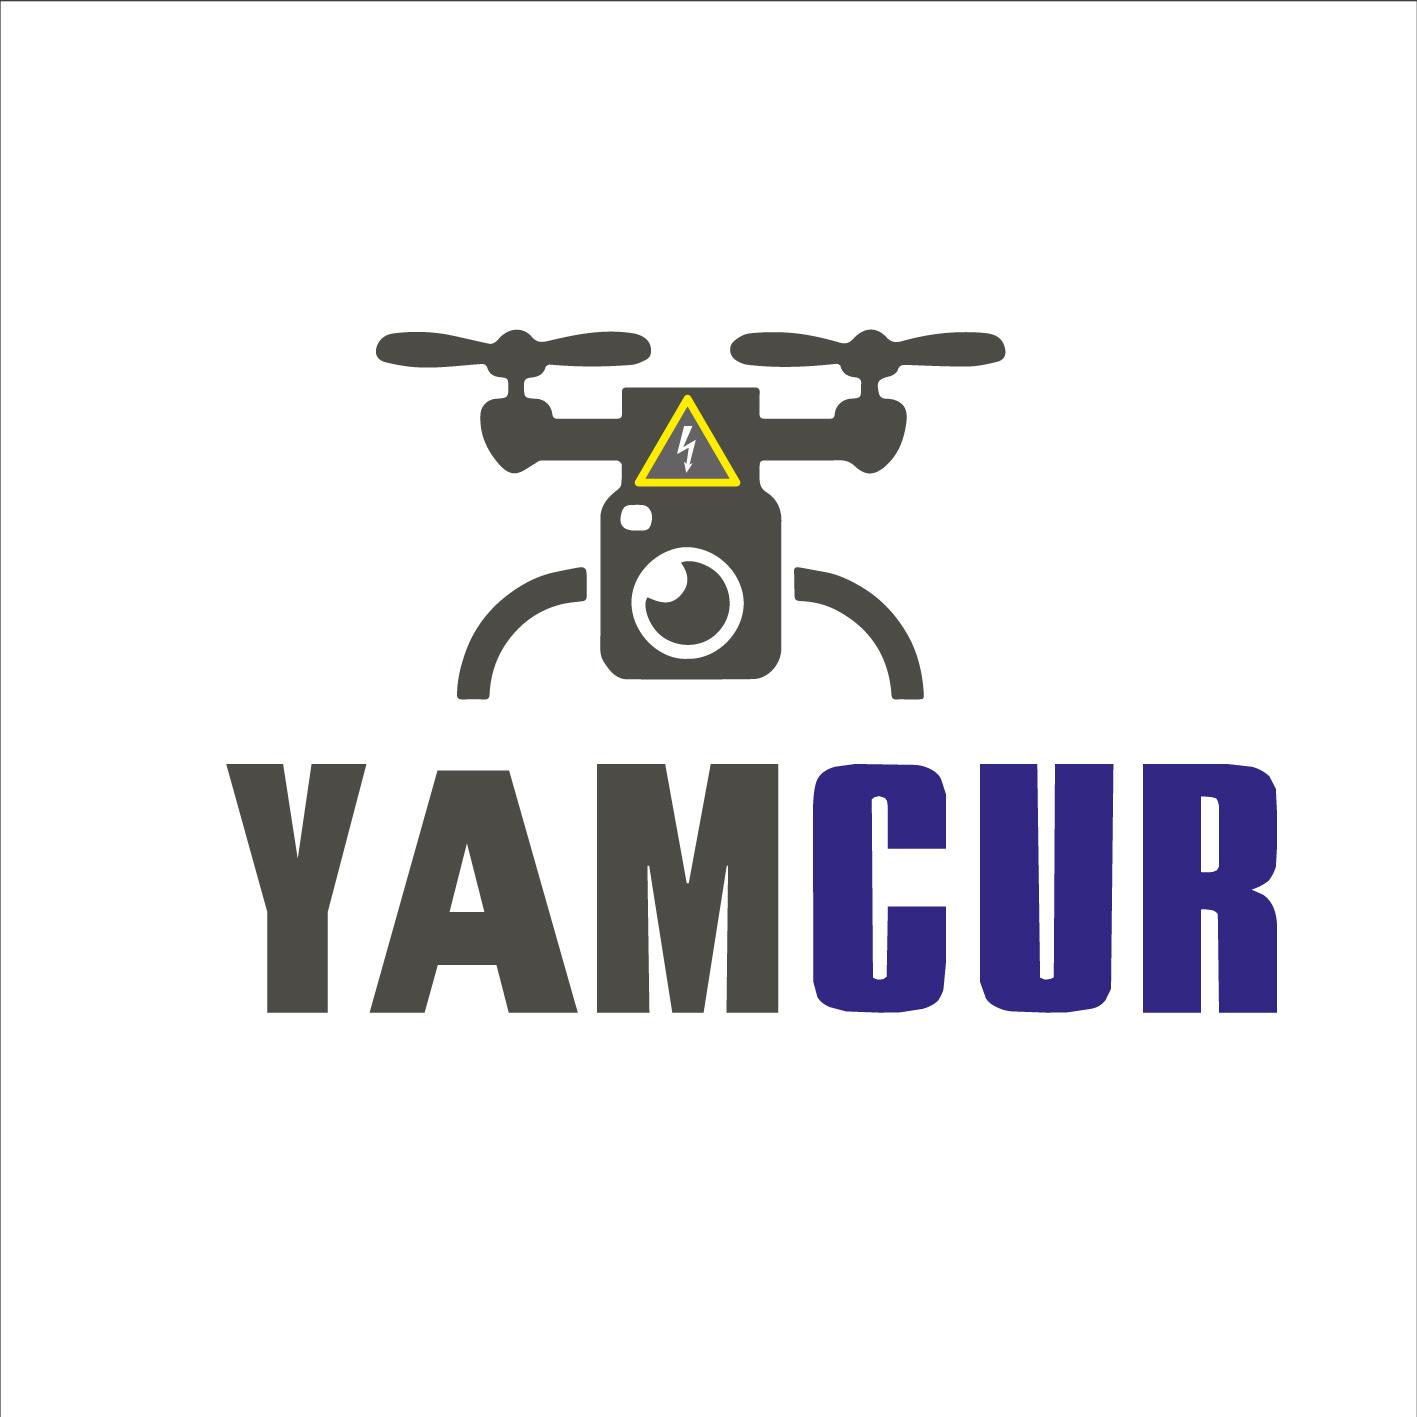 YAMCUR